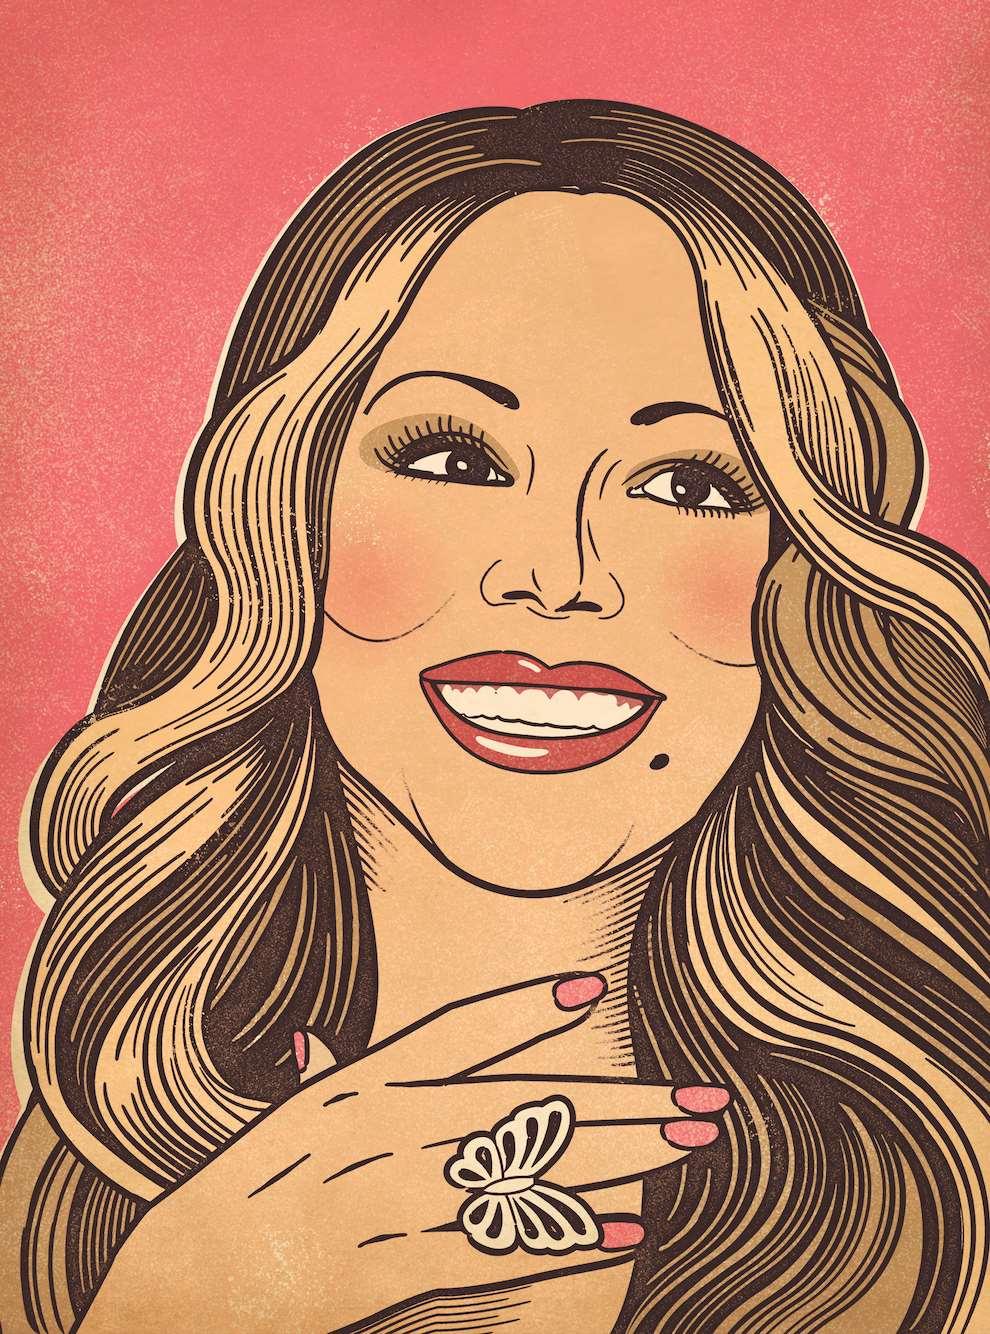 Susan Burghart, Digital portrait illustration of Maria Carey